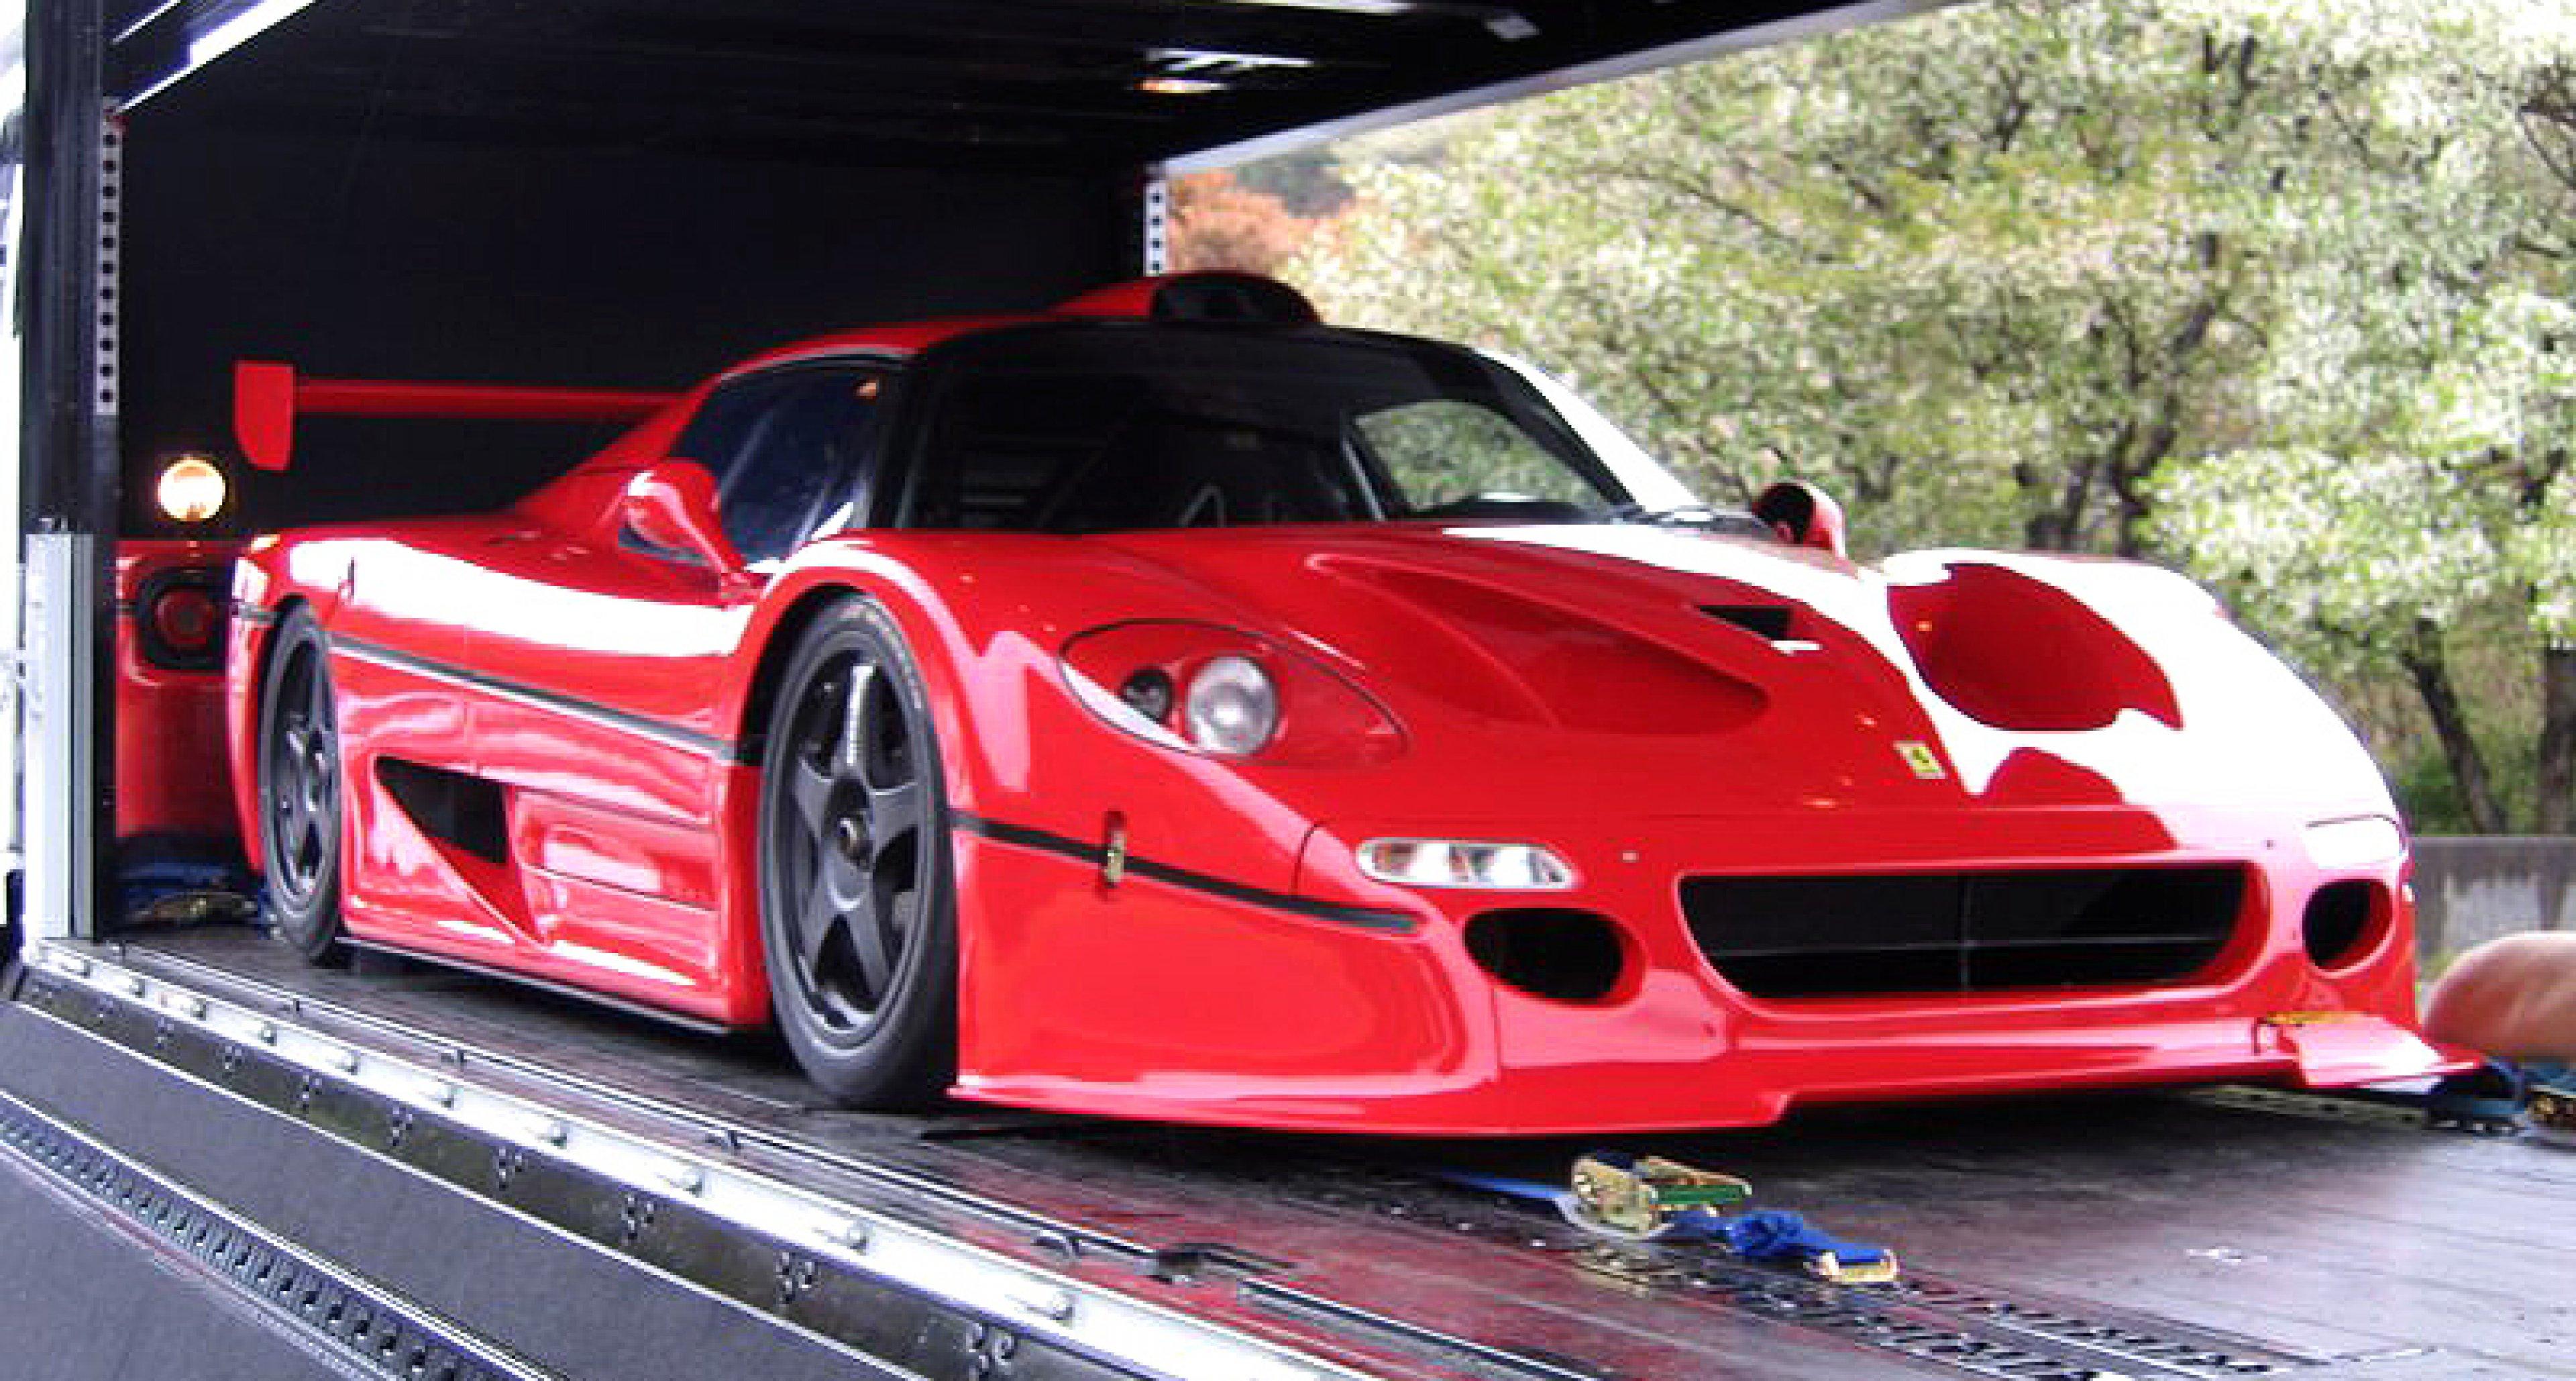 1996 Ferrari F50 GT  One of three  aac2c00b6ab5